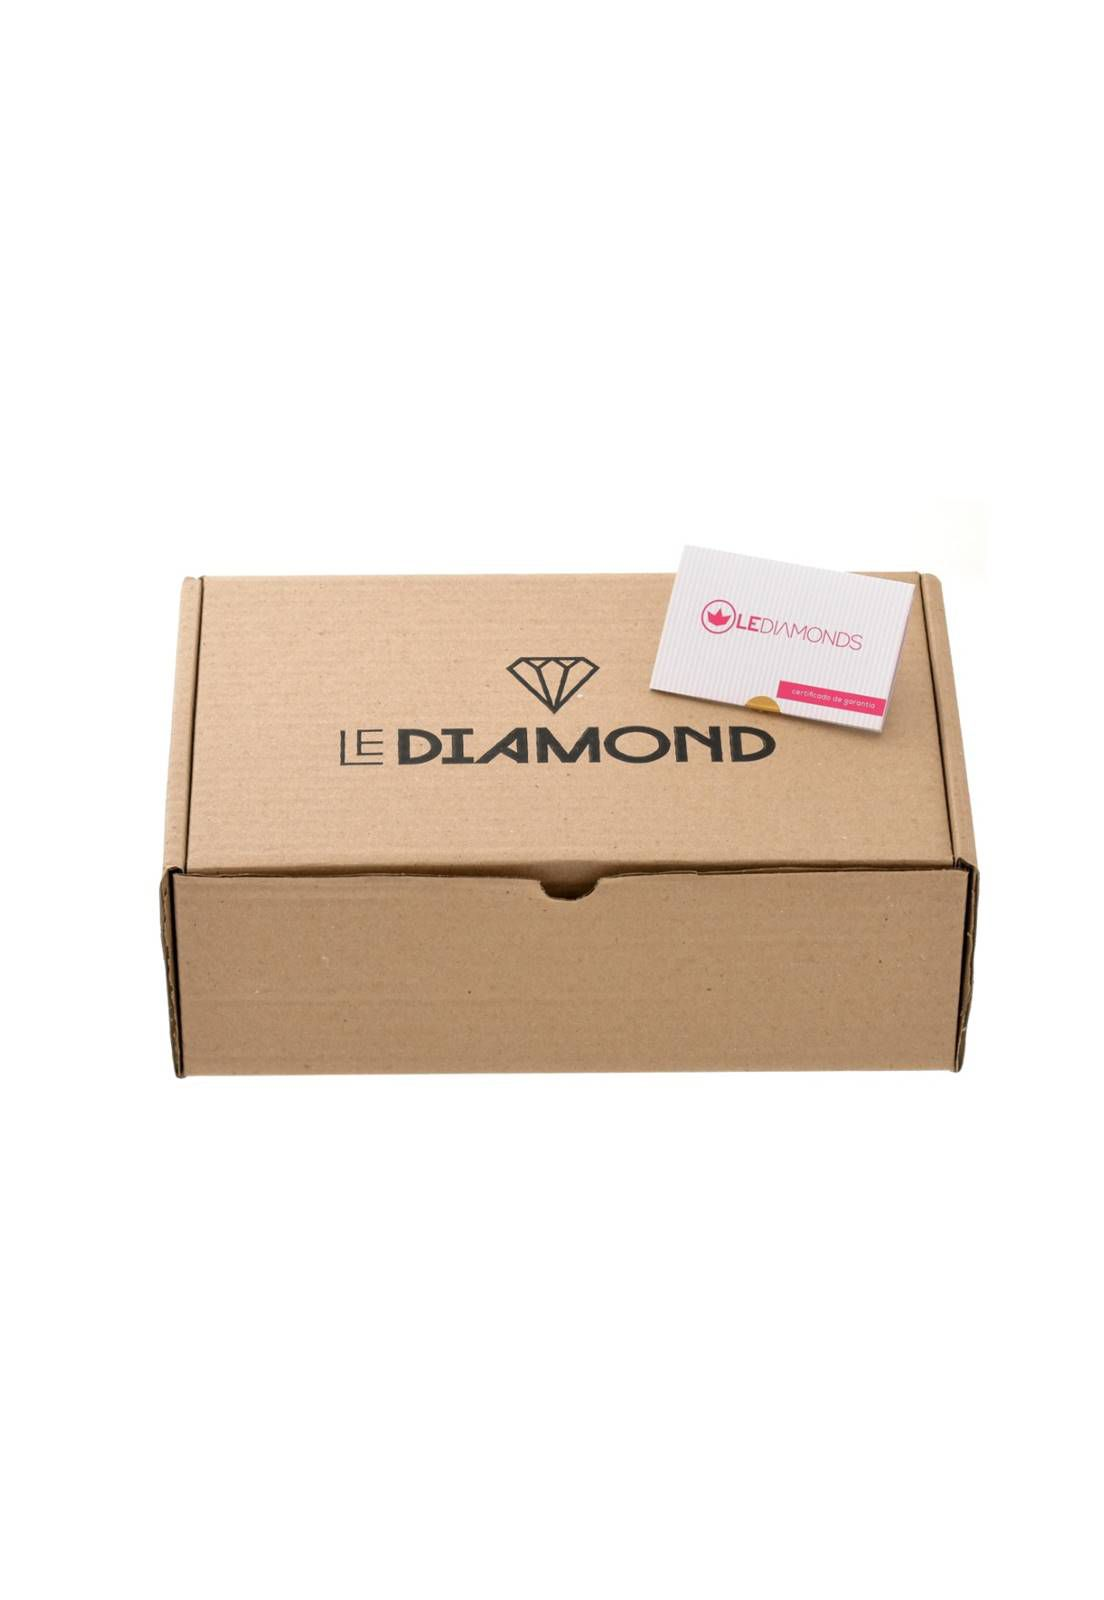 Brinco Le Diamond Chapa Amassada Dourado